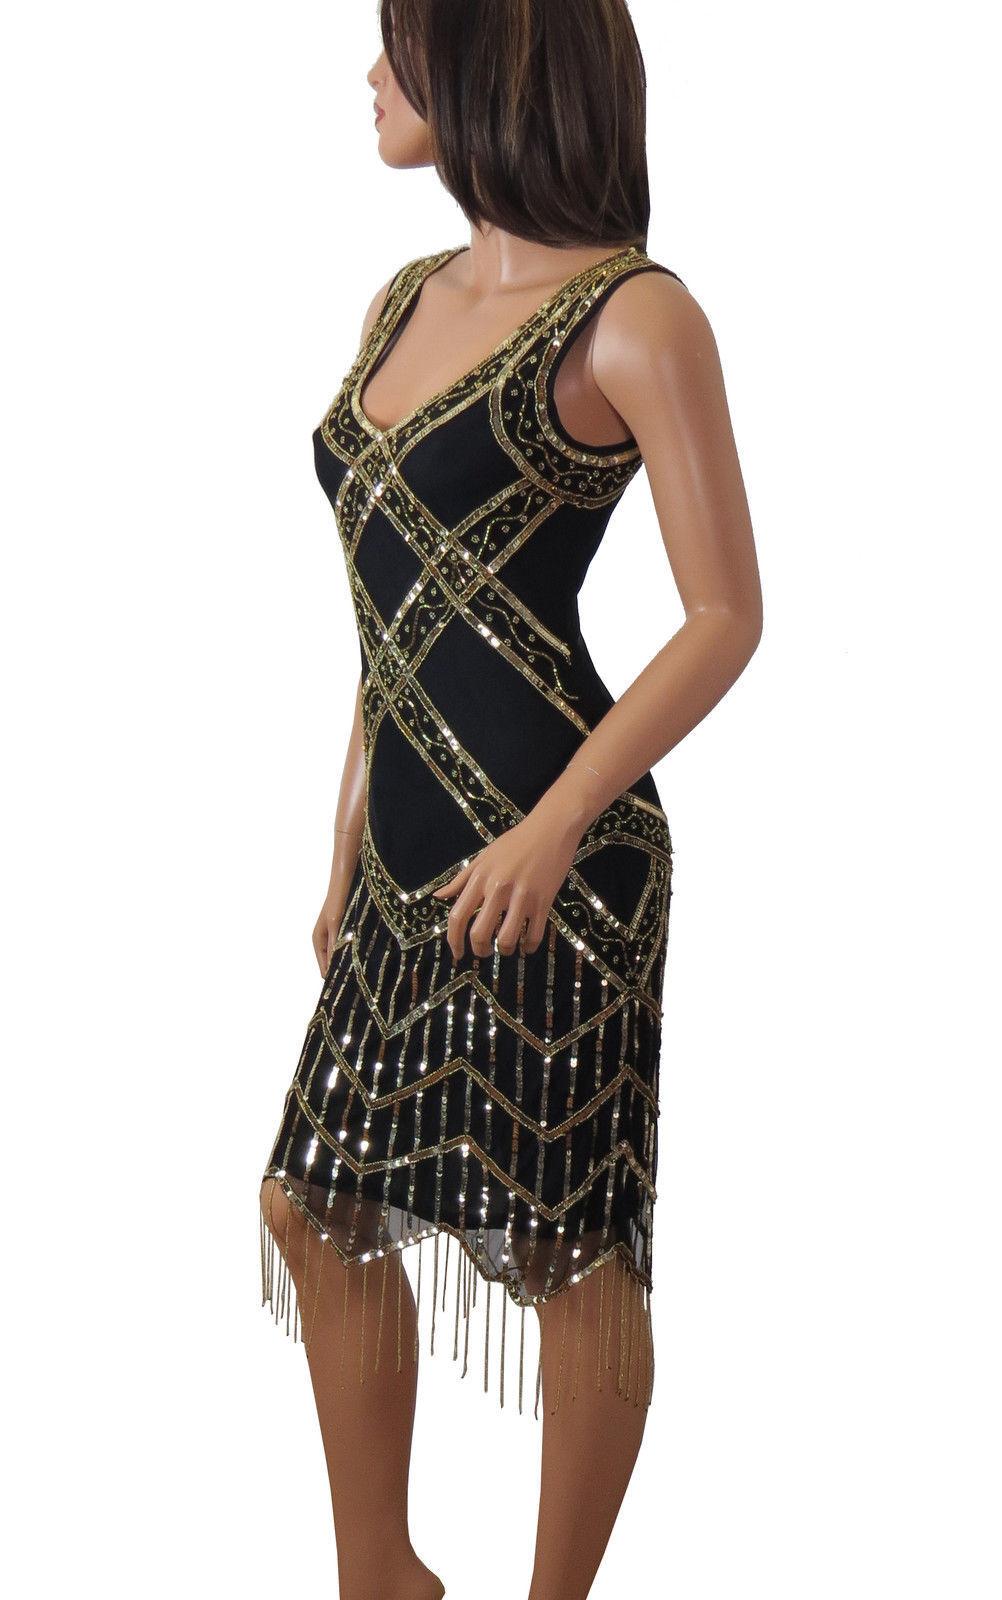 Nouveau 1920 Gatsby Garçonne oren Fbaguee DECO Ourlet Embelli Robe Petite Taille Plus